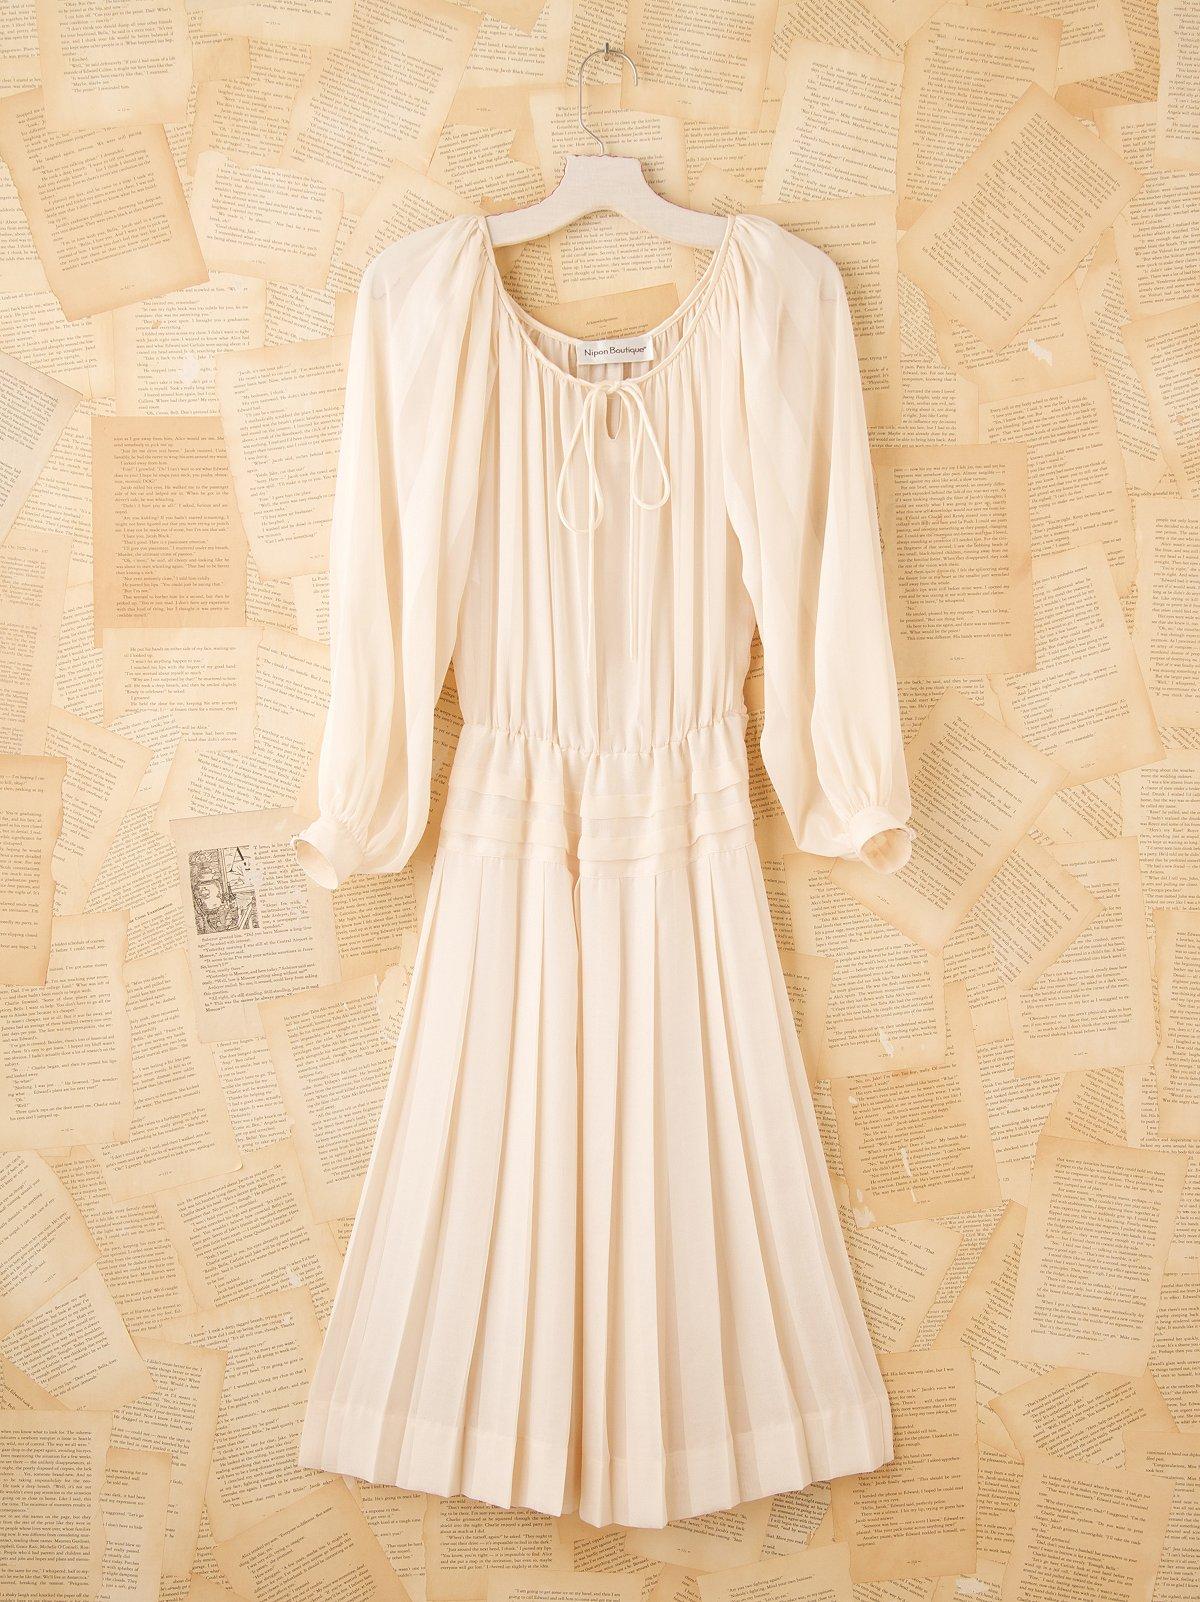 Vintage 1970s Dance Dress